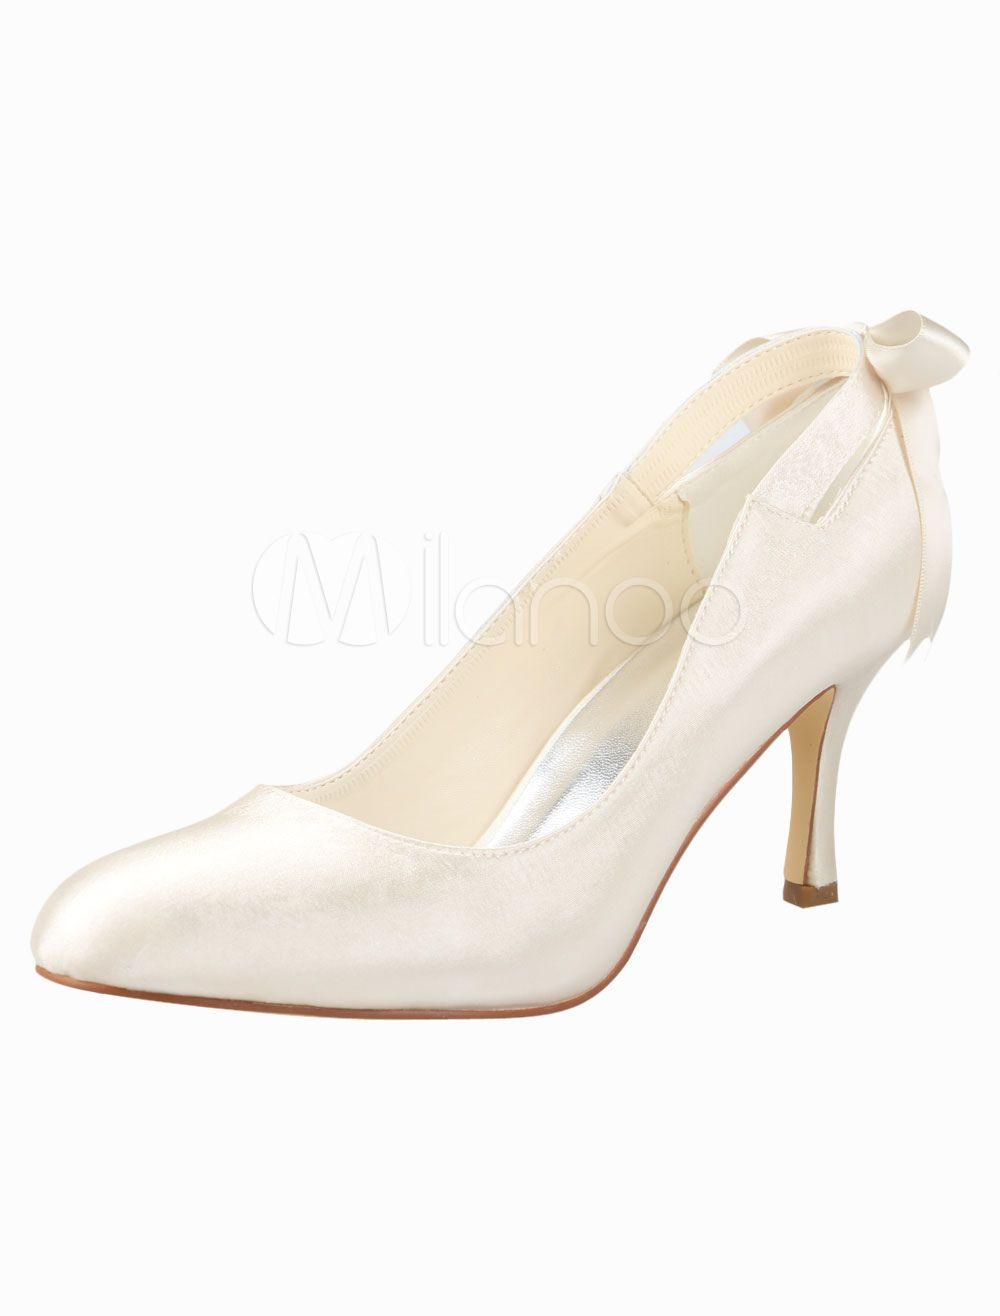 3 1/2'' High Heel Champagne Bow Satin Wedding Pump Shoes - Milanoo.com $47.99